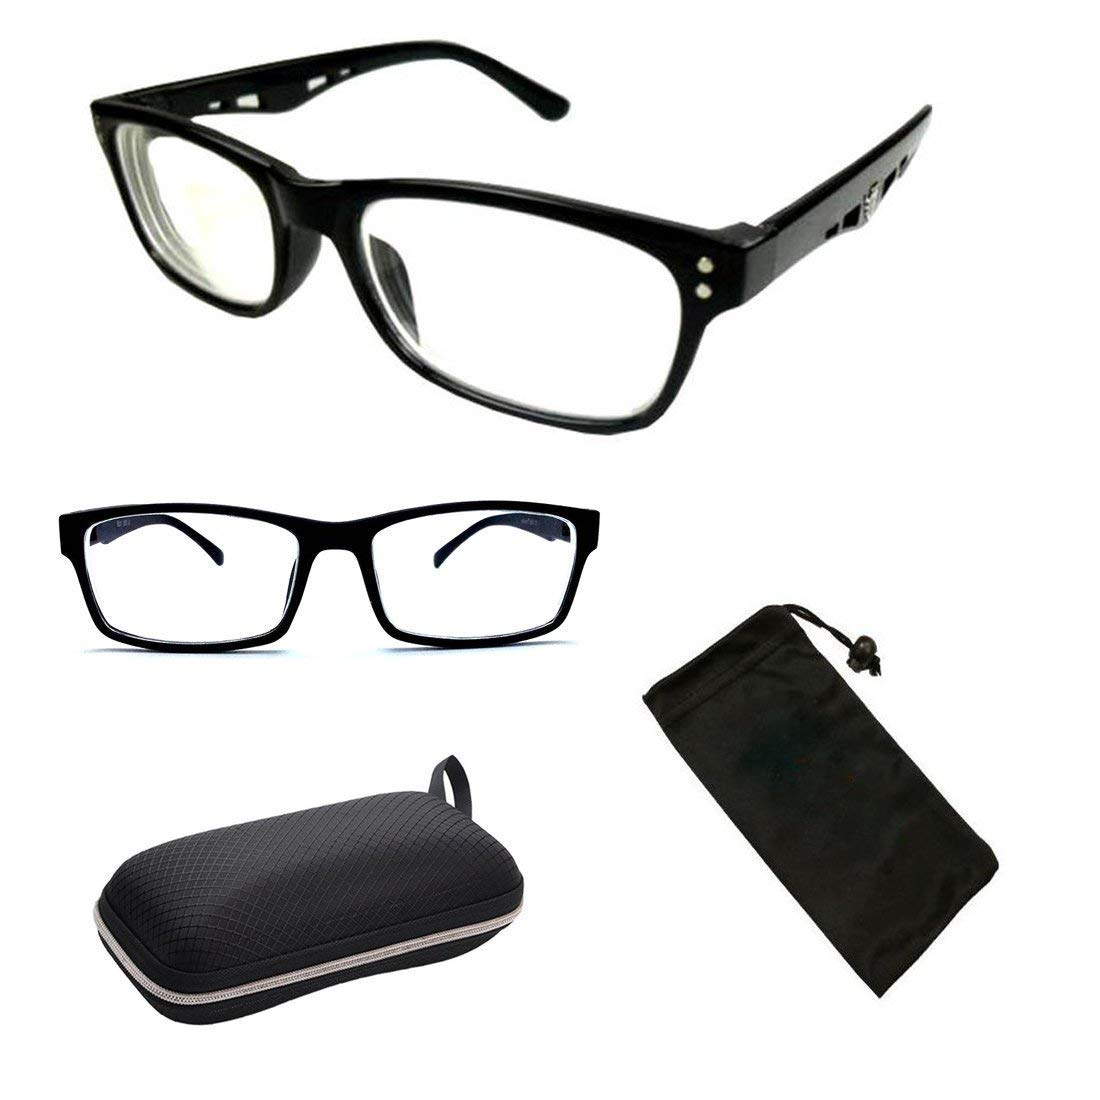 d2ed312b77 Amazon.com  2 Pairs Nearsighted Myopia Lens Plastic Frame Eyeglass Glasses  Men   Women  Health   Personal Care